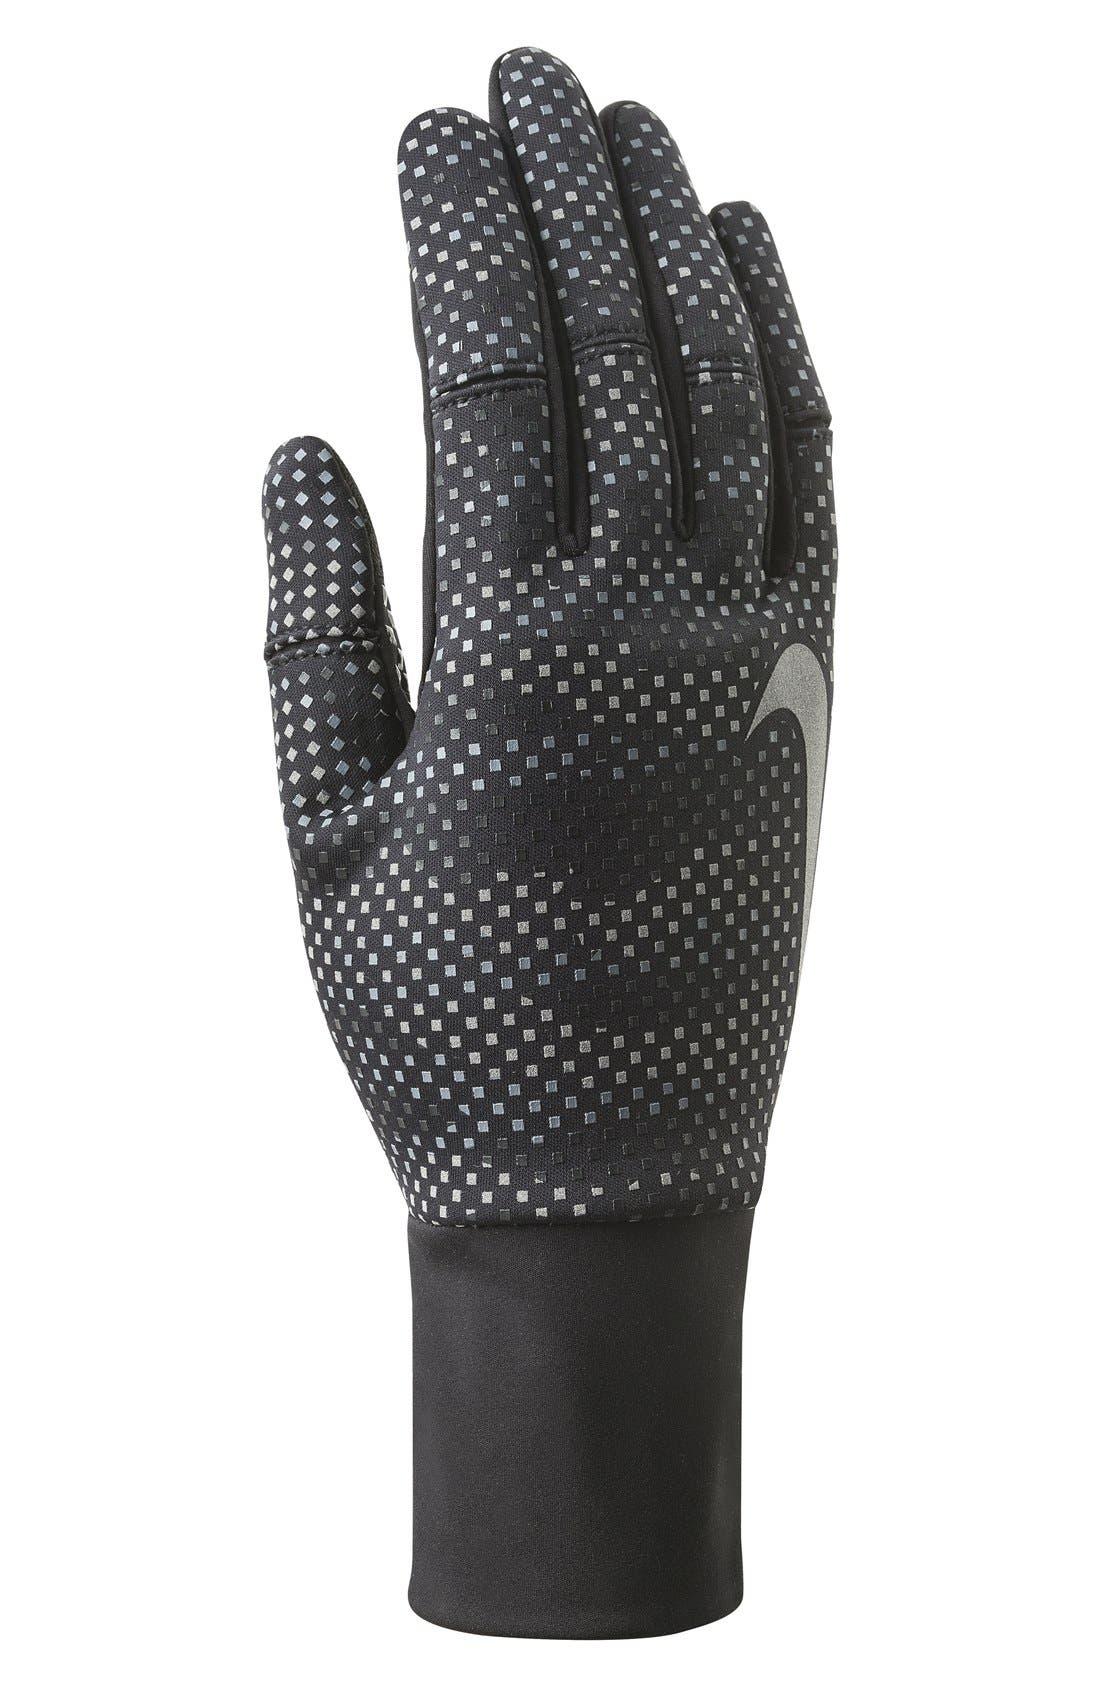 NIKE,                             'Vapor Flash 2.0' Gloves,                             Main thumbnail 1, color,                             078